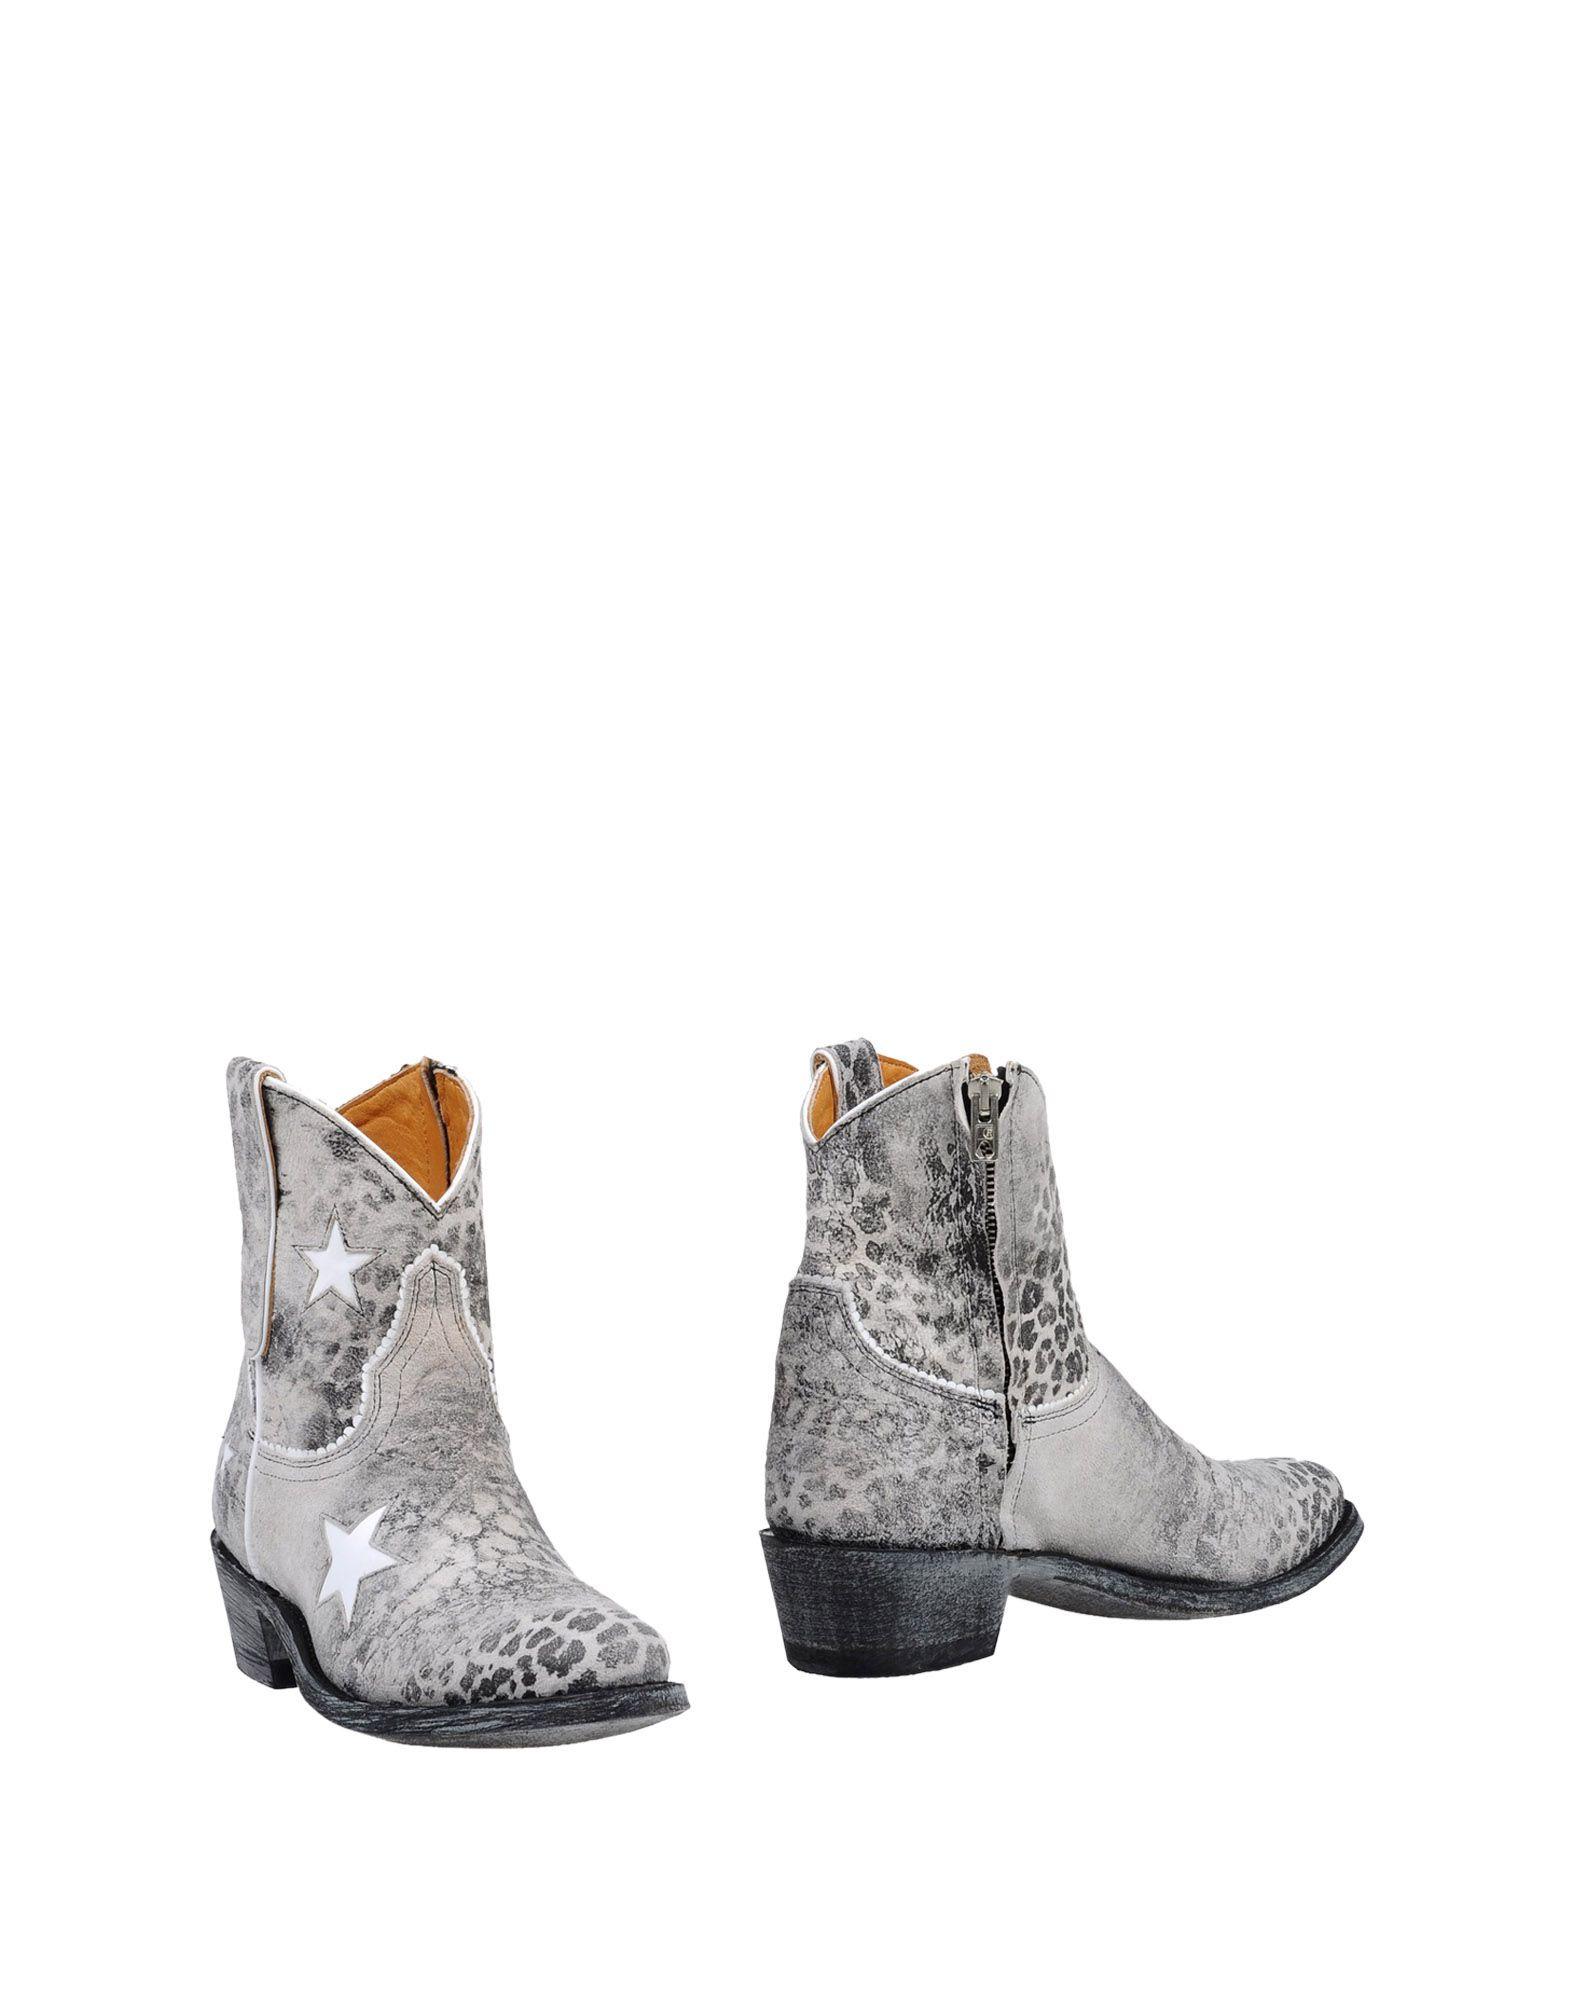 Mexicana Stiefelette Damen  11382674IR 11382674IR  Heiße Schuhe 163bb7